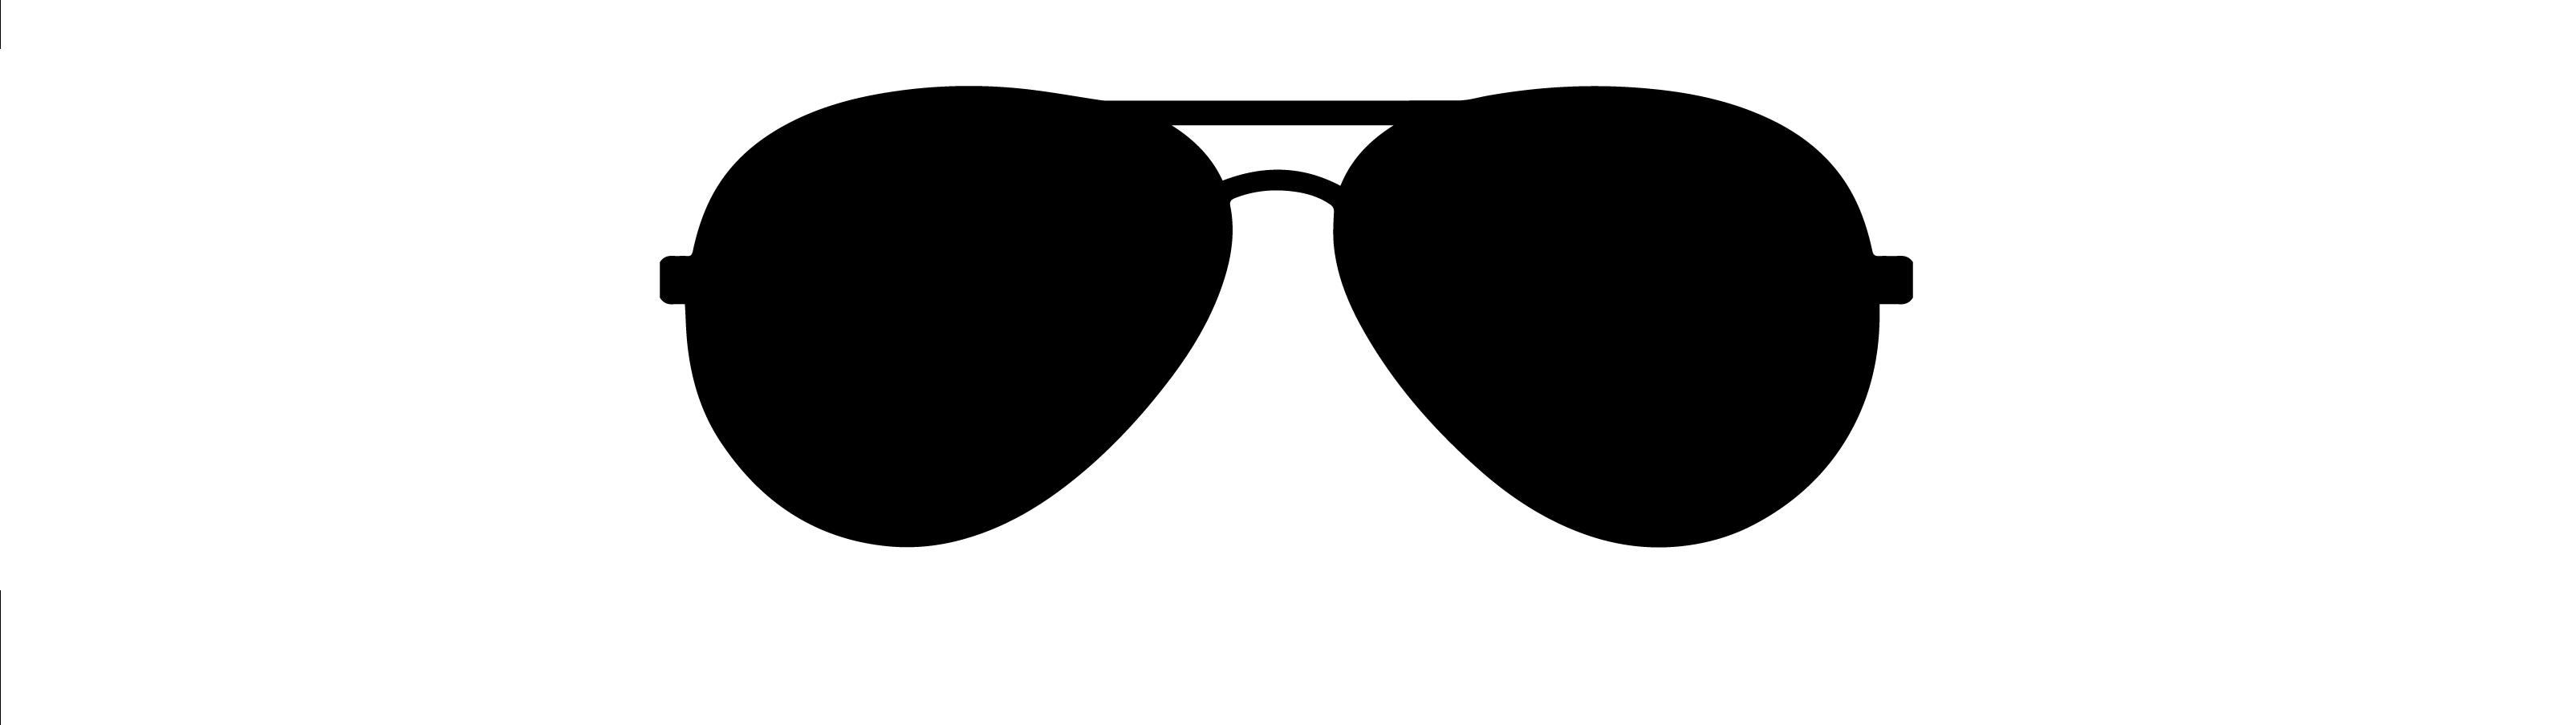 sunglasses clipart aviator #144727192